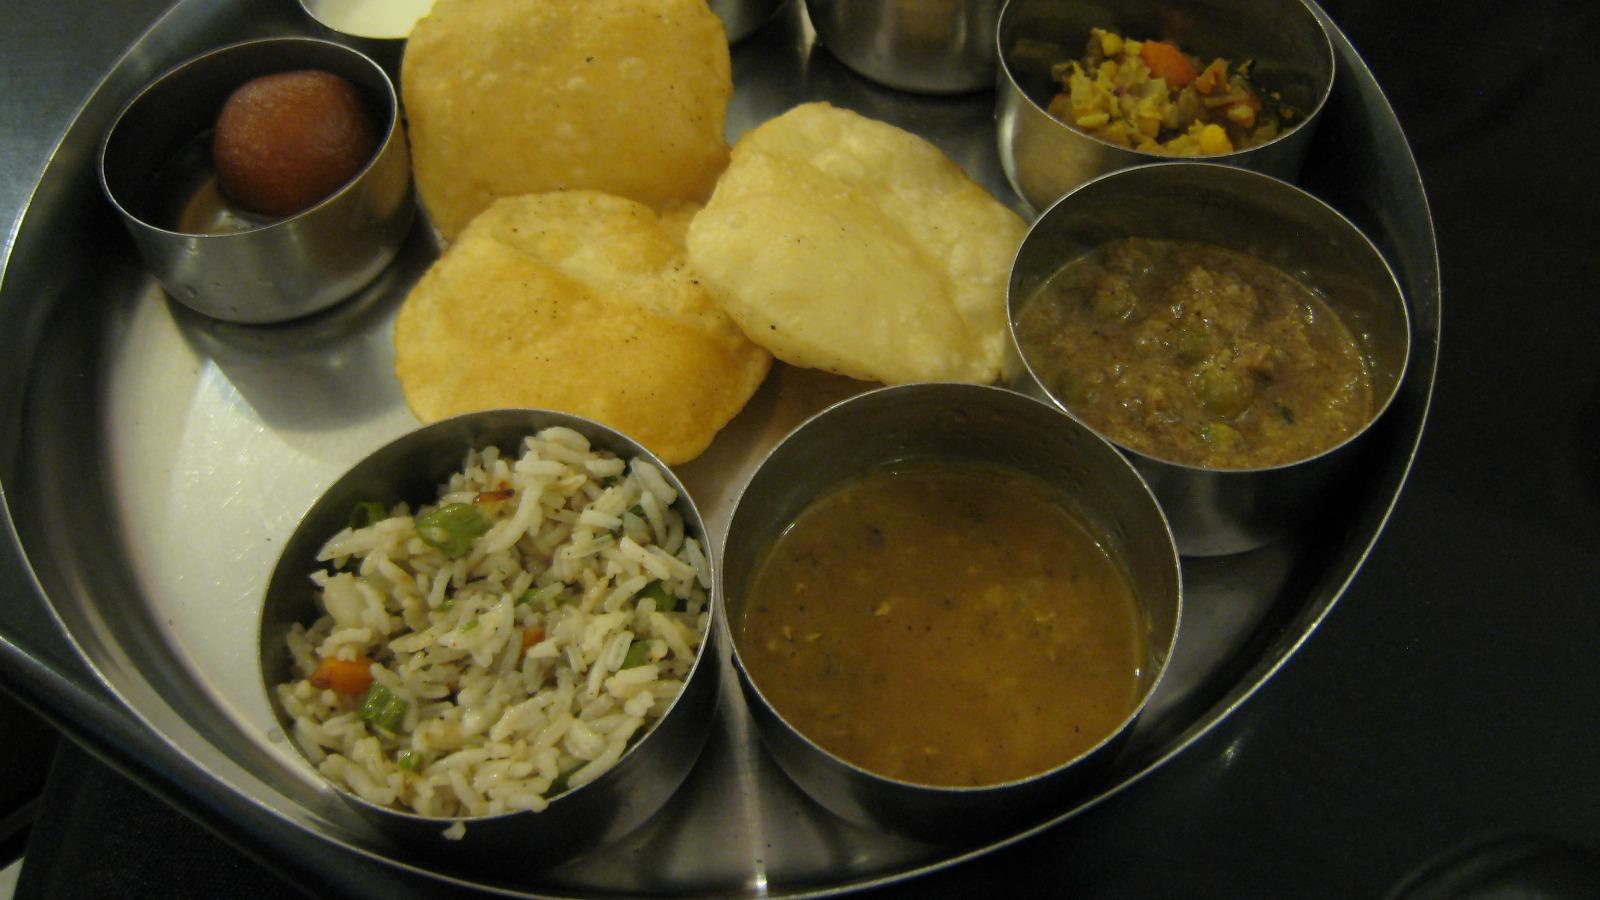 100 nepal facts culture recipes language cultural - 100 pics solution cuisine ...